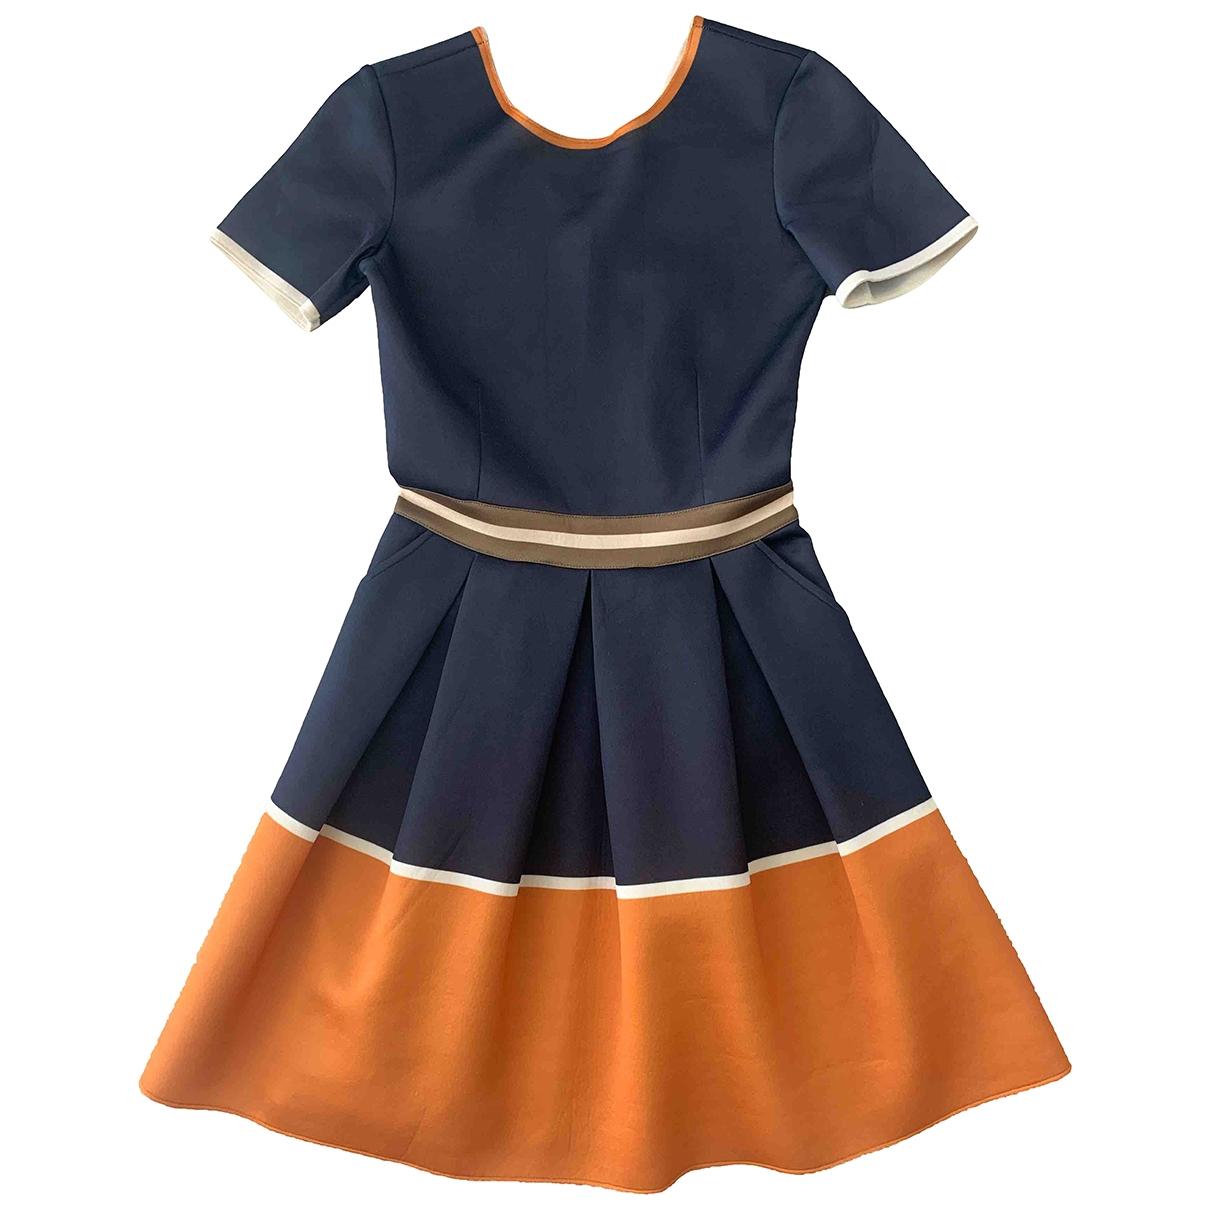 Patrizia Pepe \N Blue dress for Women 38 IT